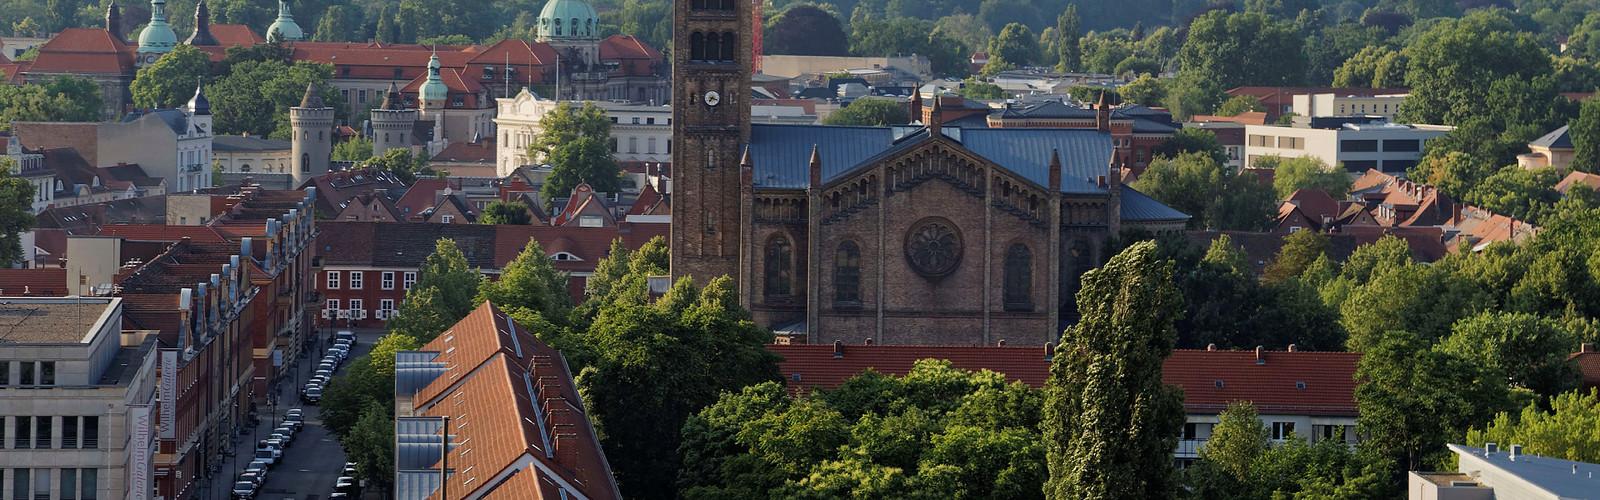 St. Peter und Paul Kirche - PMSG André Stiebitz